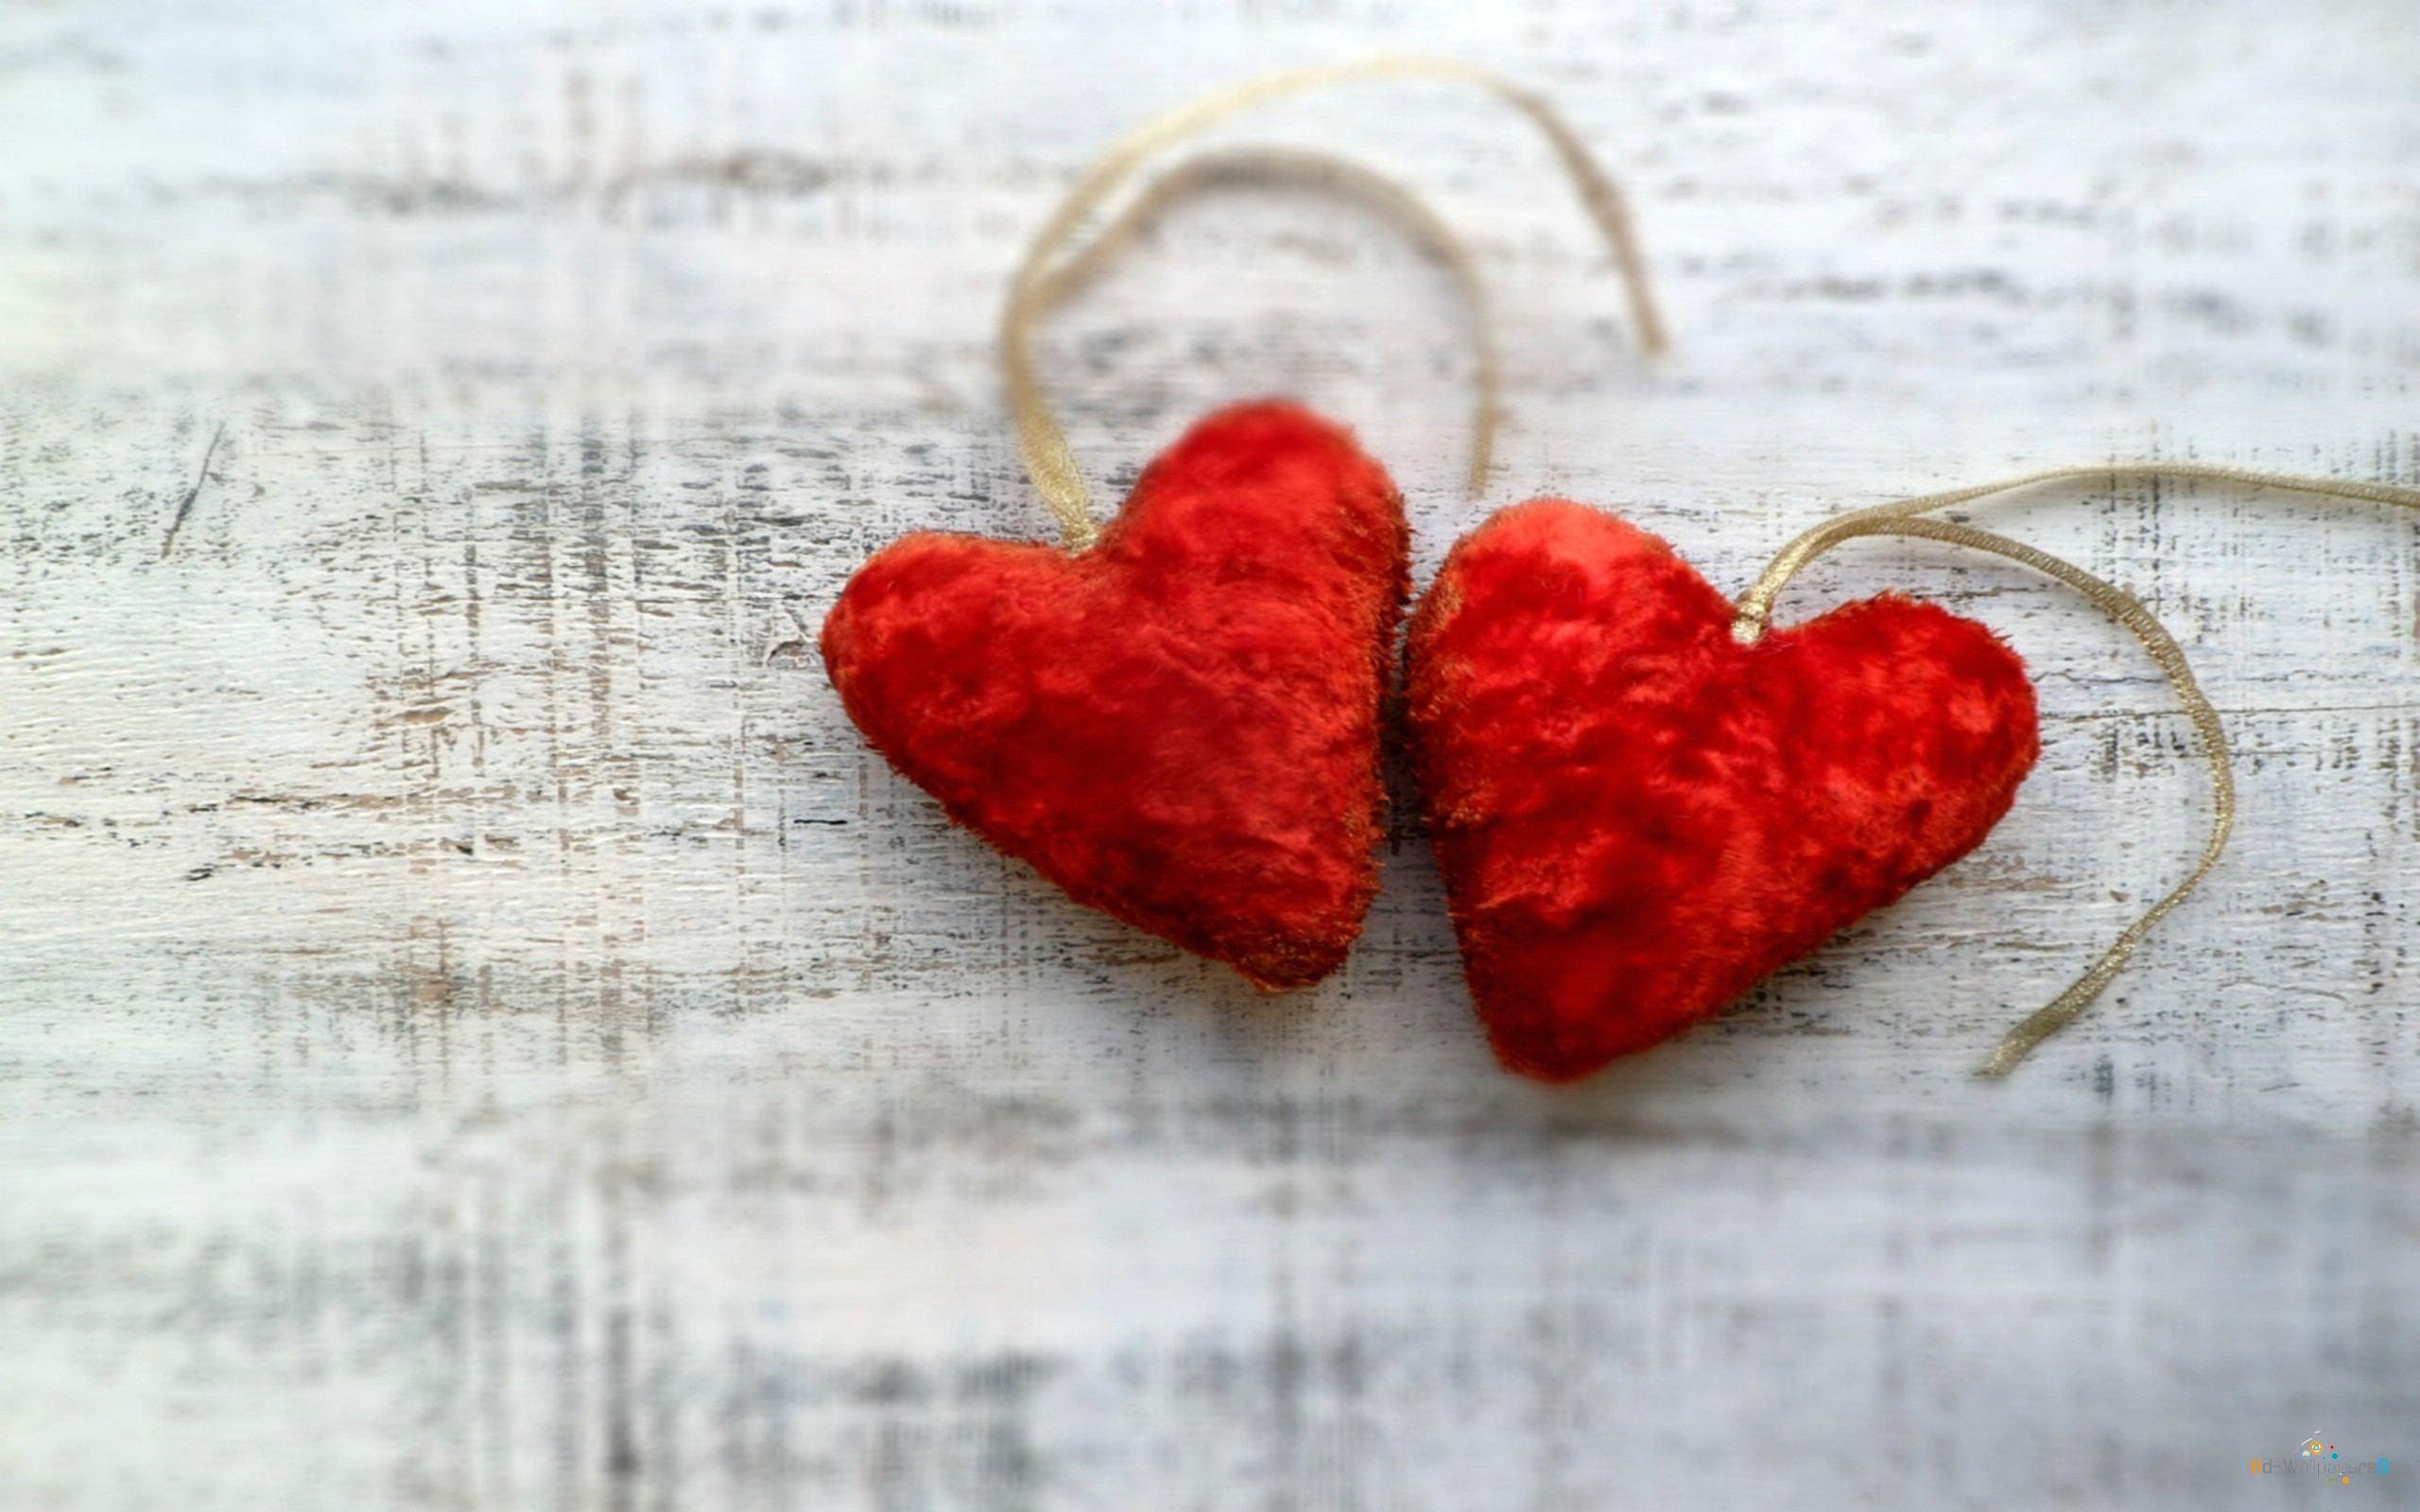 Love Heart Full Hd Wallpaper Love Heart Full Hd Wallpaper Pictures Nbsp3gallery Beautiful Love Images Love Doesnt Hurt Heart Wallpaper